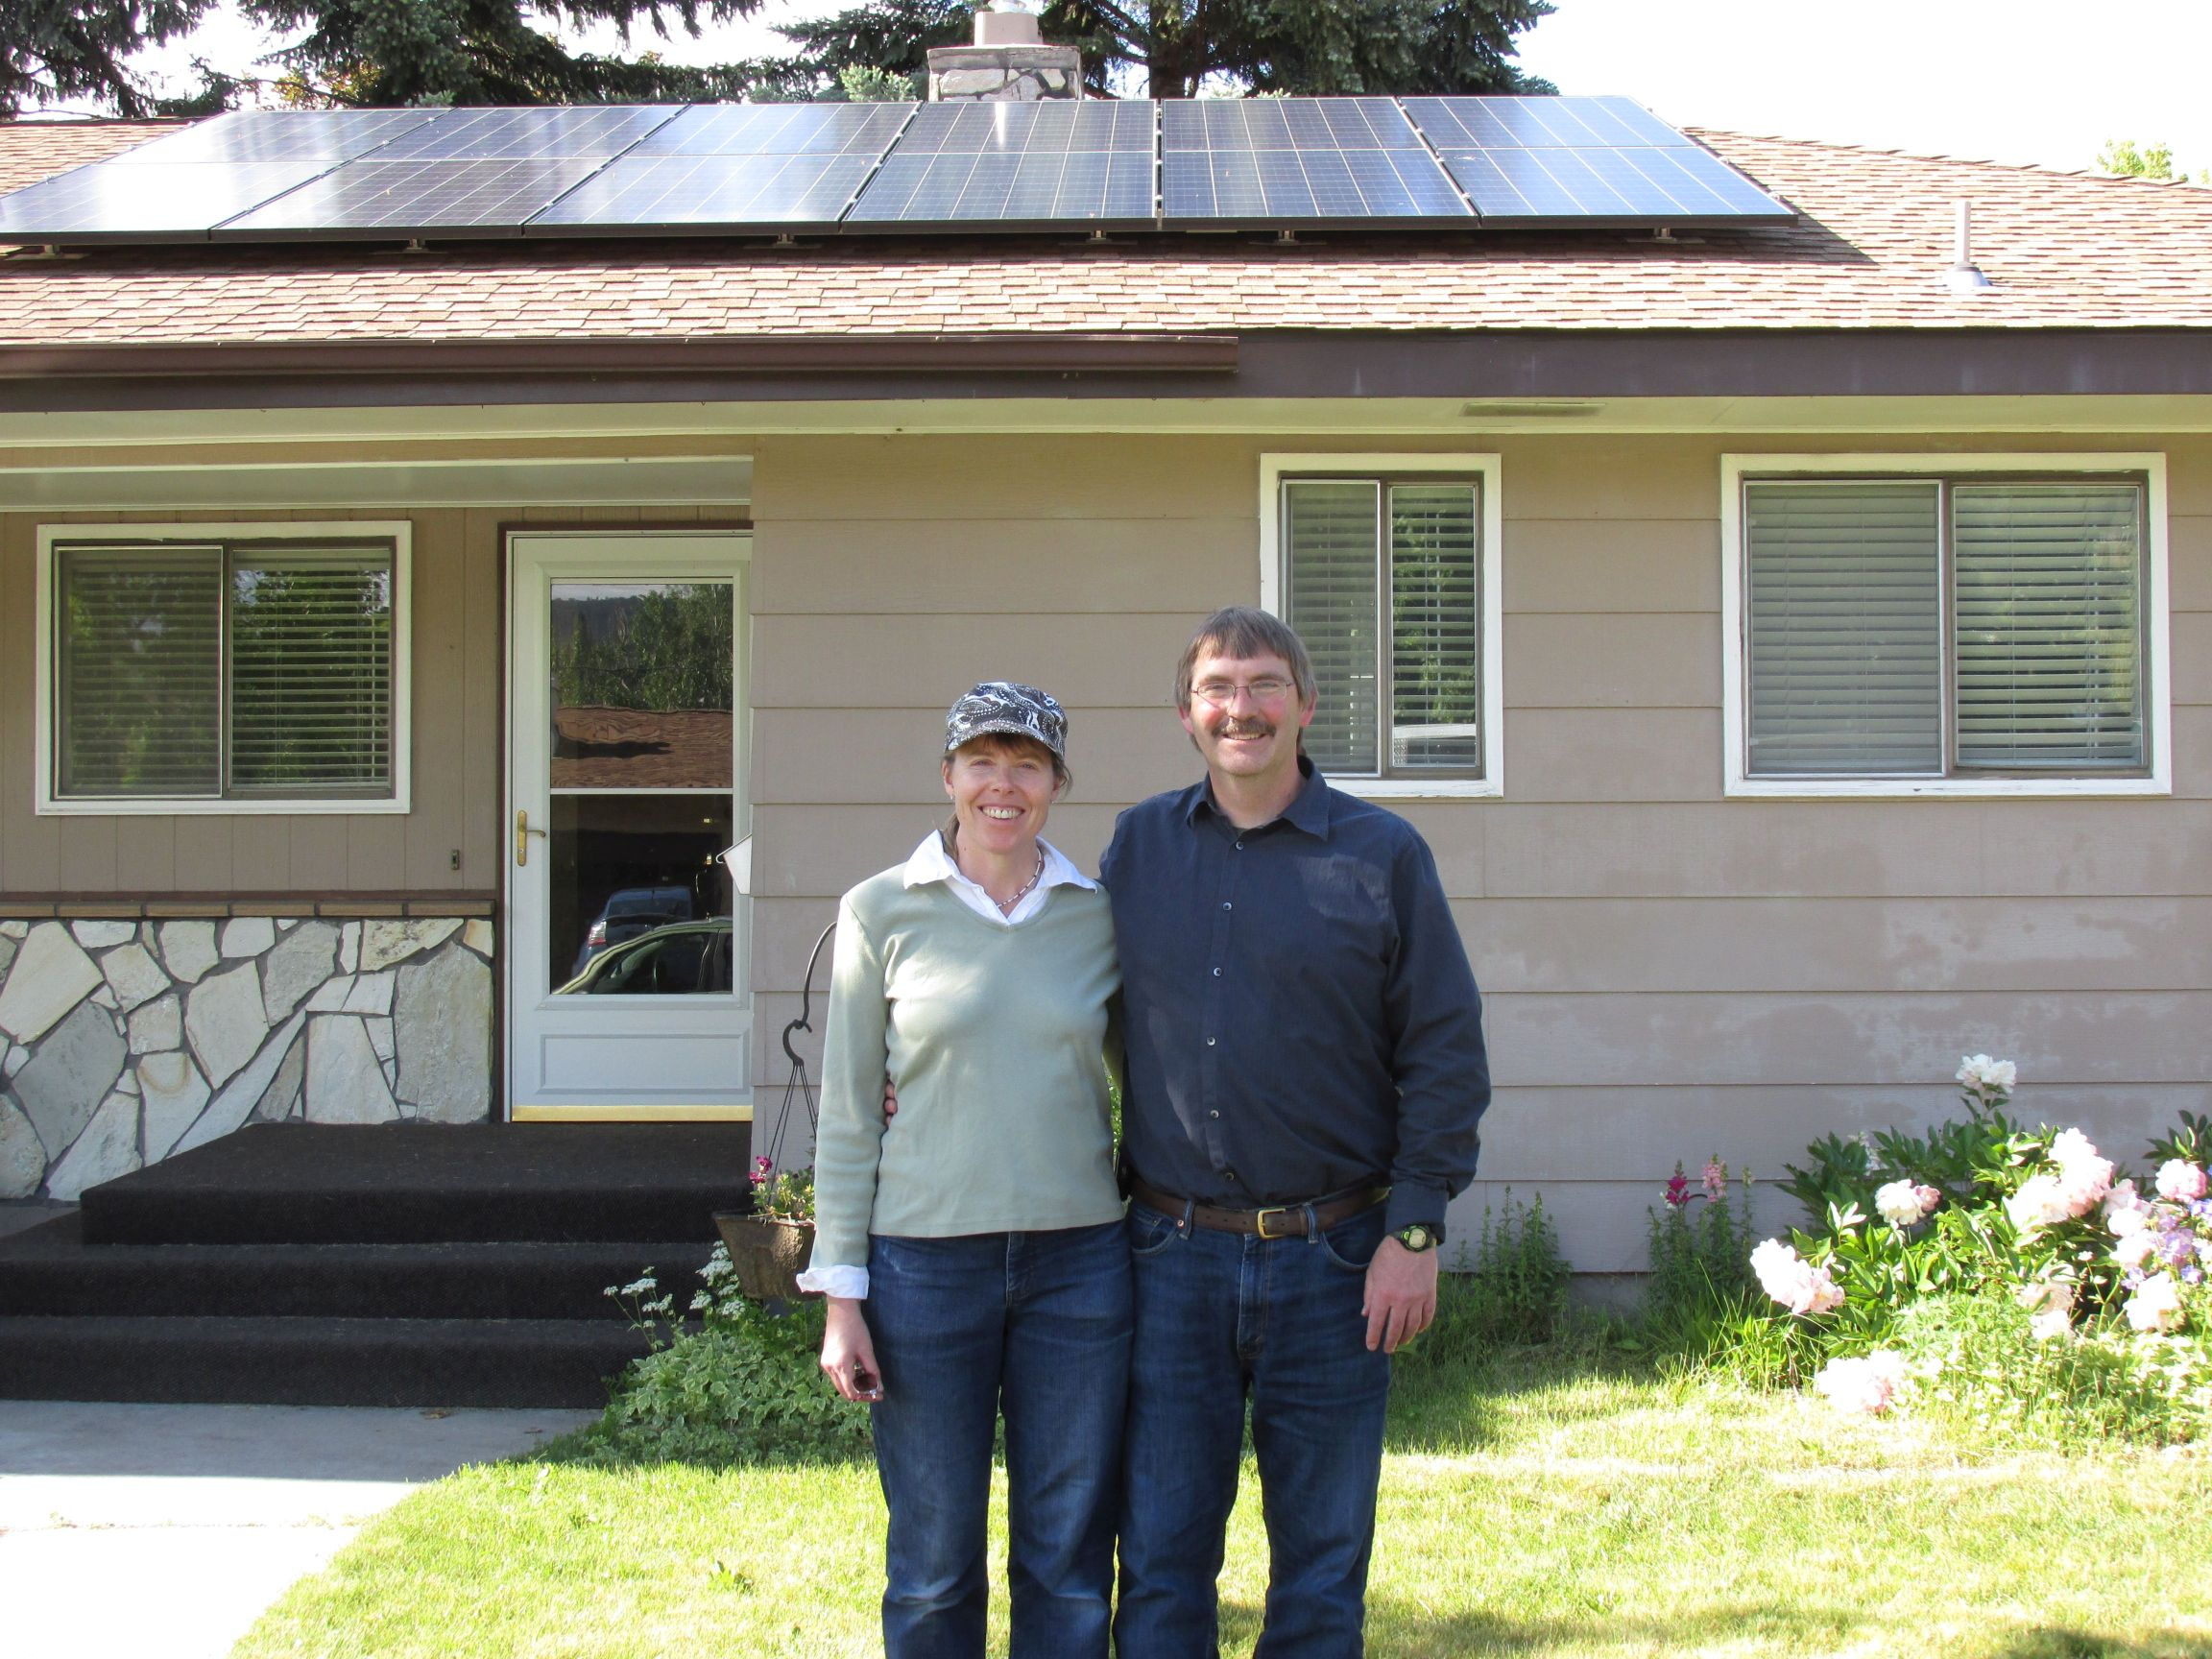 'Solarize' Makes Solar Simple for Missoula Couple